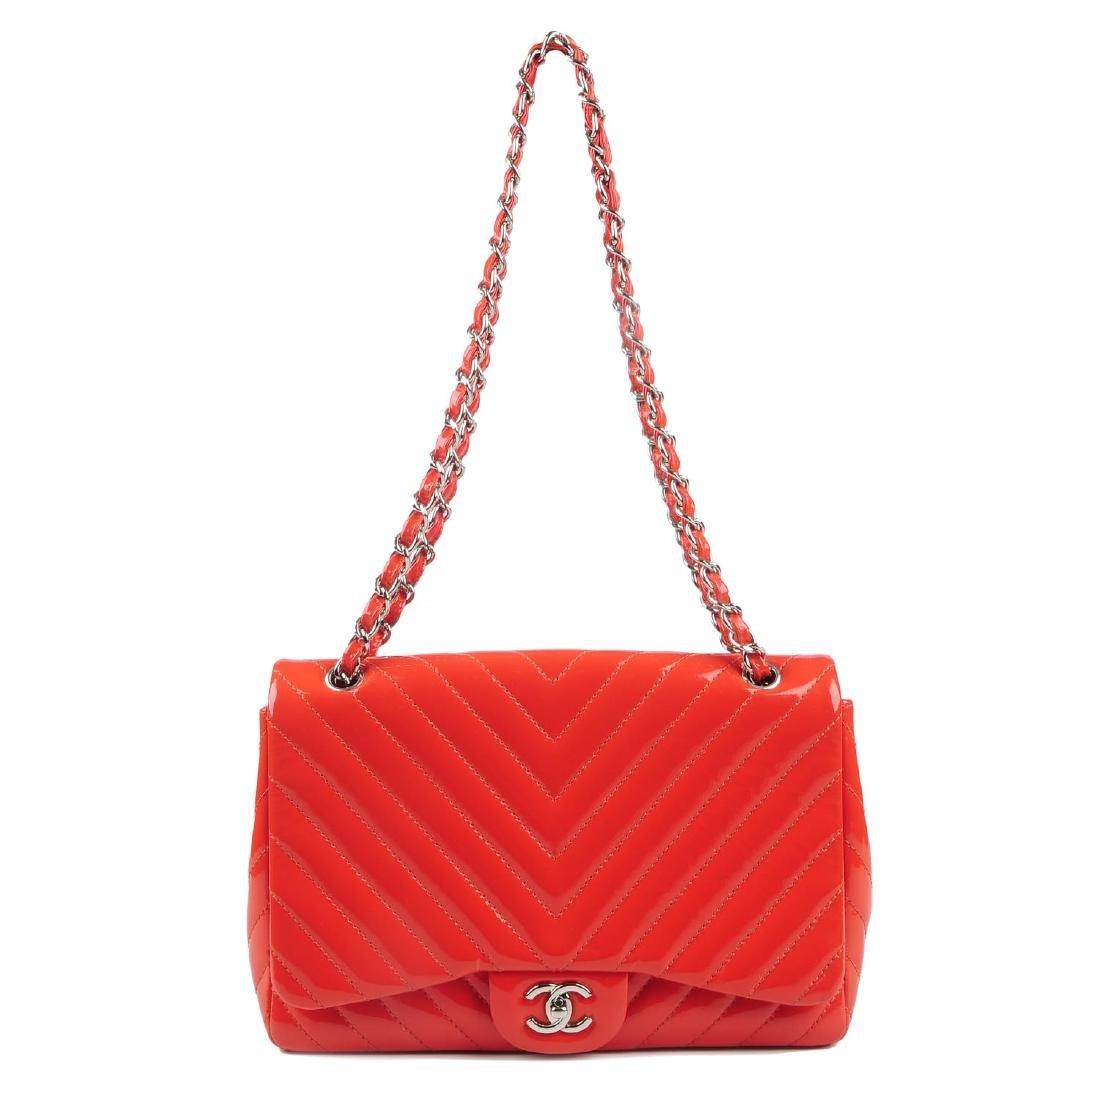 CHANEL - a Jumbo Single Flap handbag. Designed with